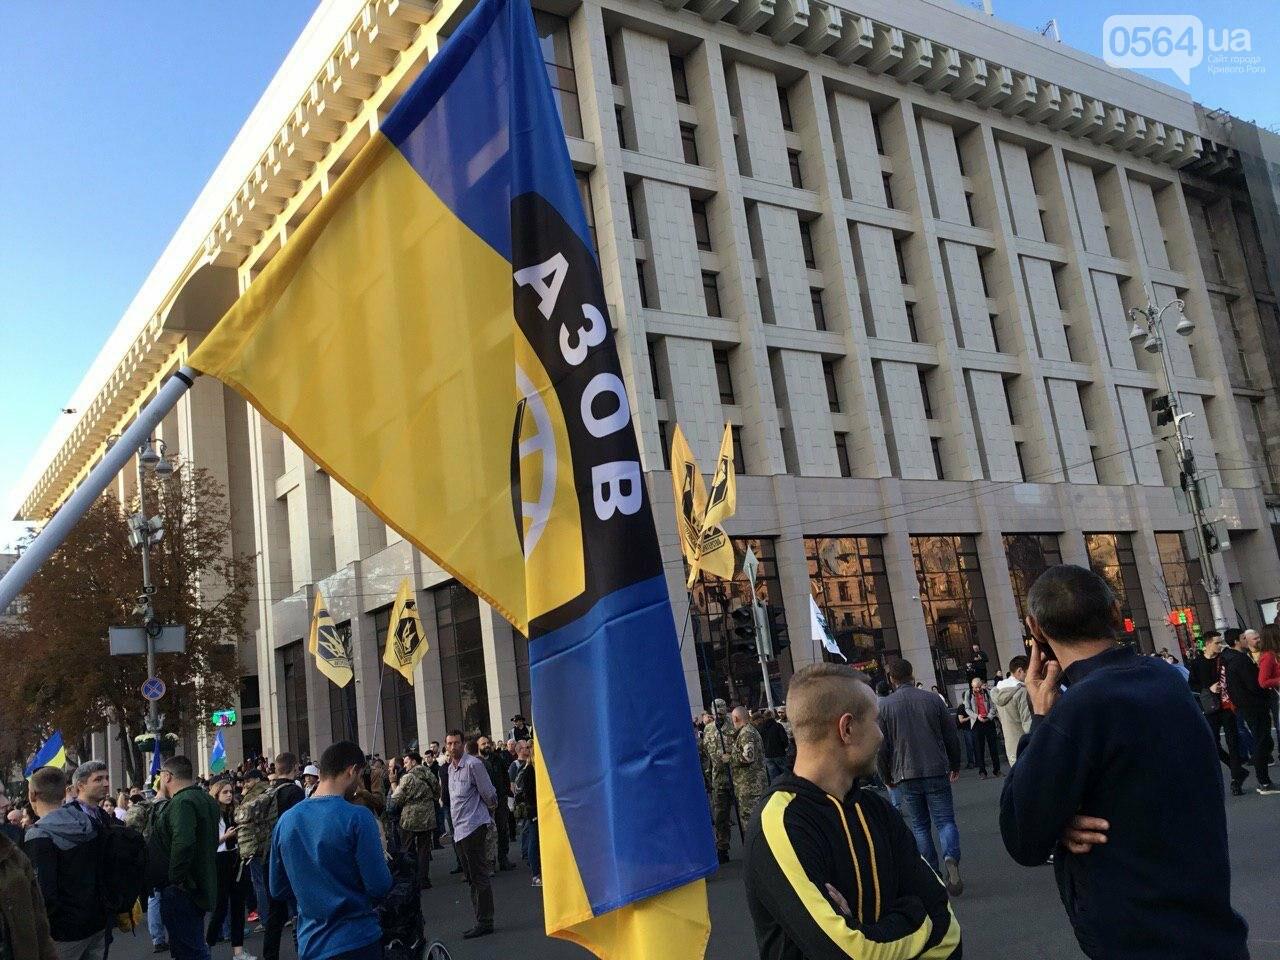 Криворожане поддержали Марш сопротивления капитуляции в Киеве, - ФОТО, ВИДЕО, ОБНОВЛЕНО, фото-35